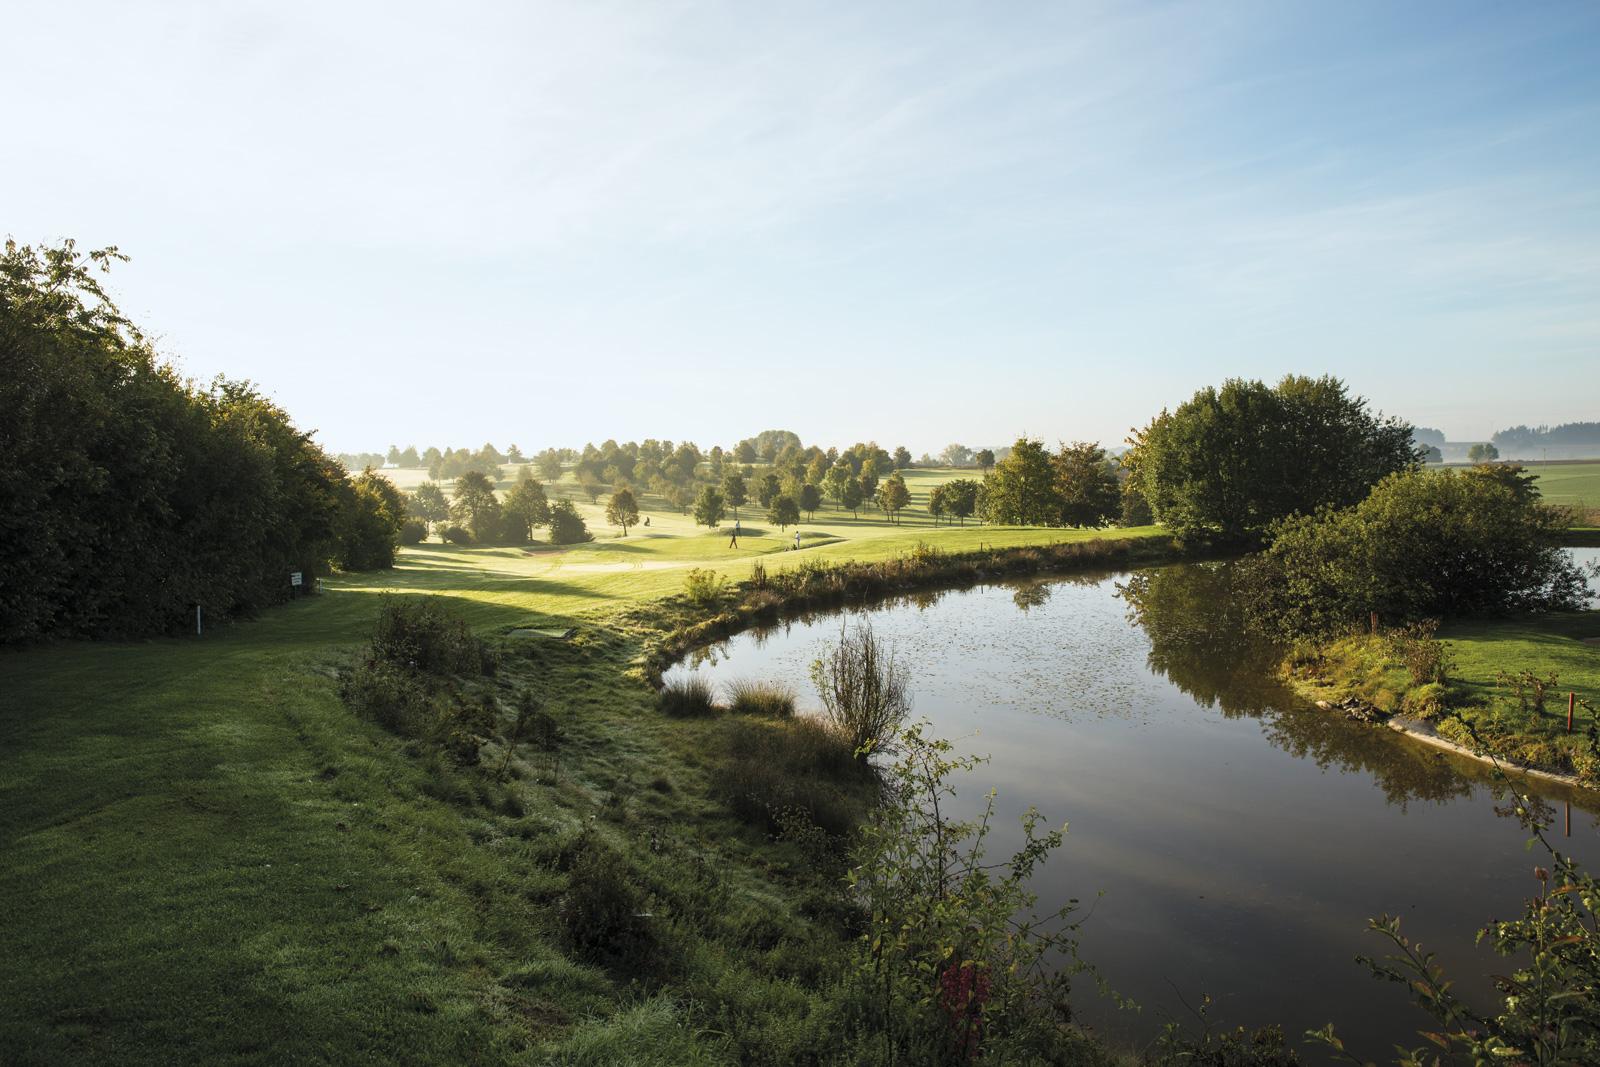 Overview of golf course named Golf Club Habsberg - Jura Golf Park